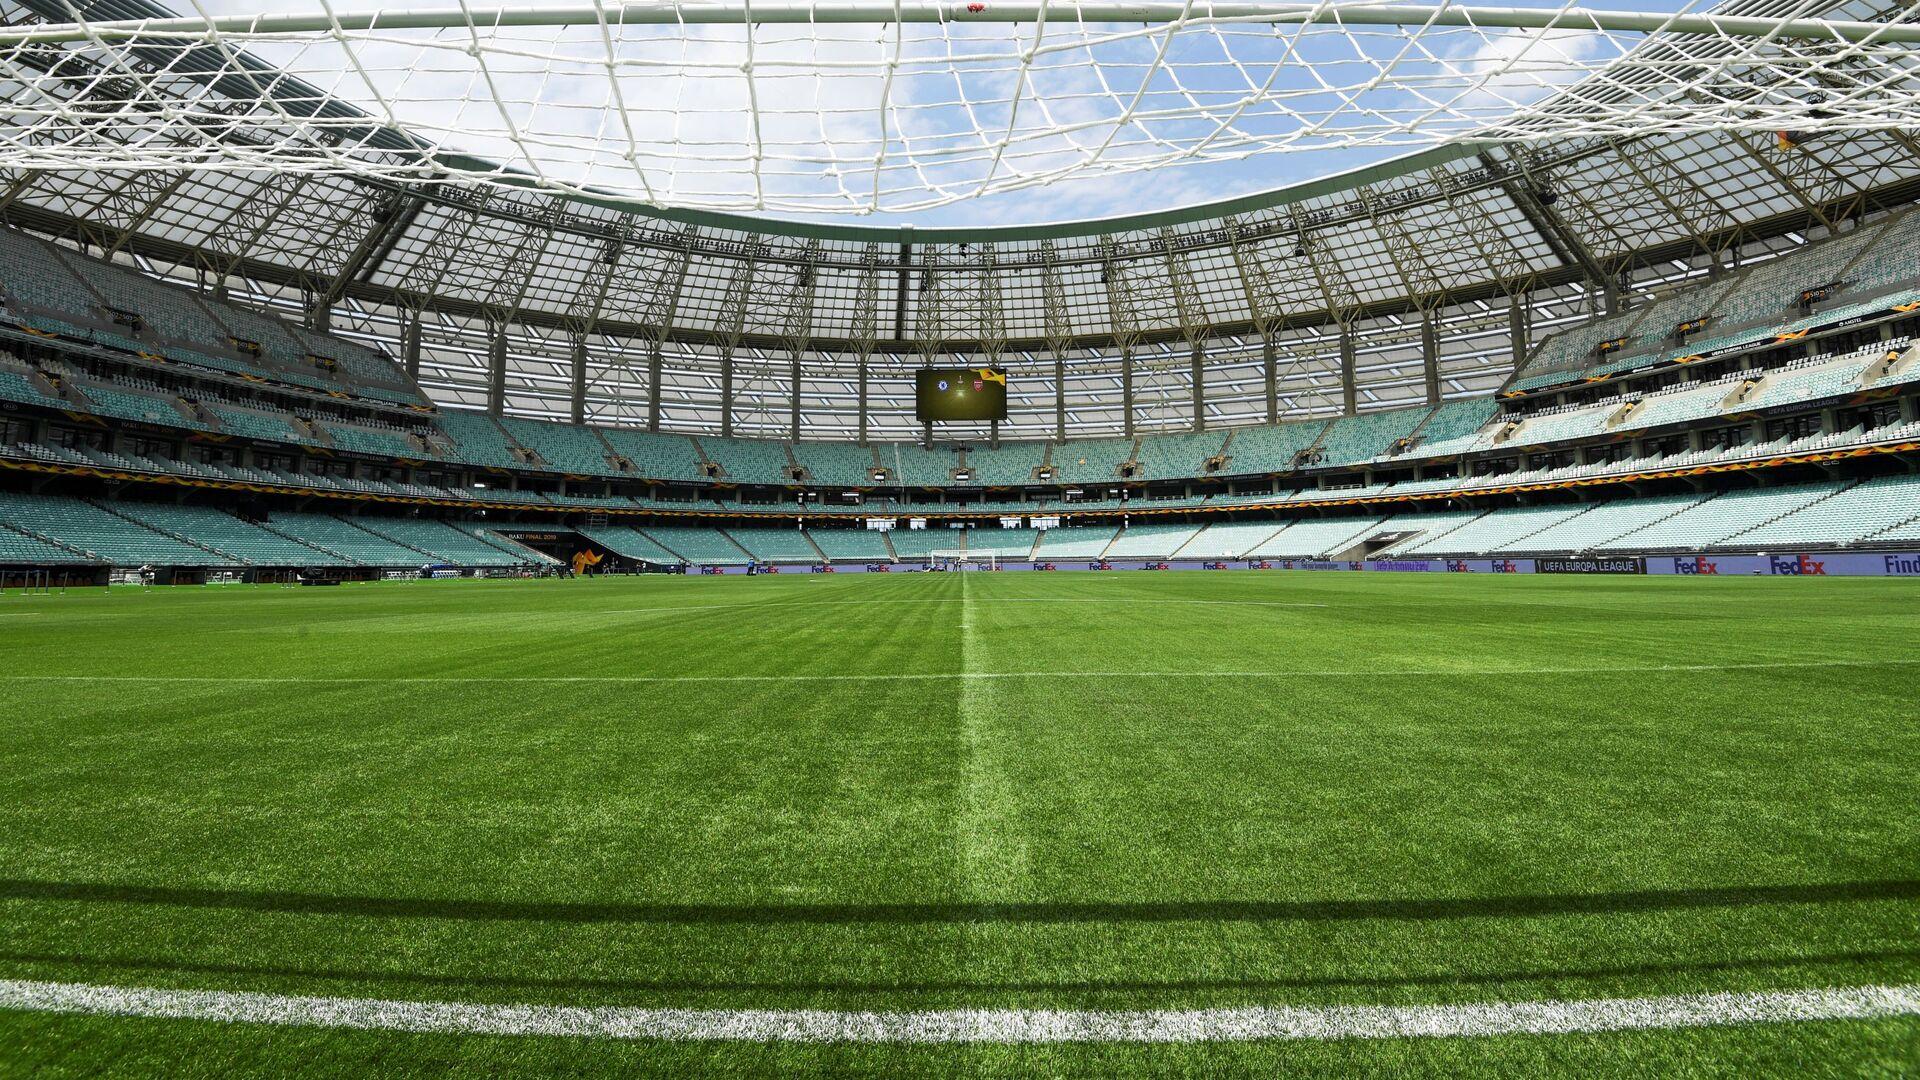 Бакинский Олимпийский стадион, фото из архива - Sputnik Азербайджан, 1920, 01.07.2021